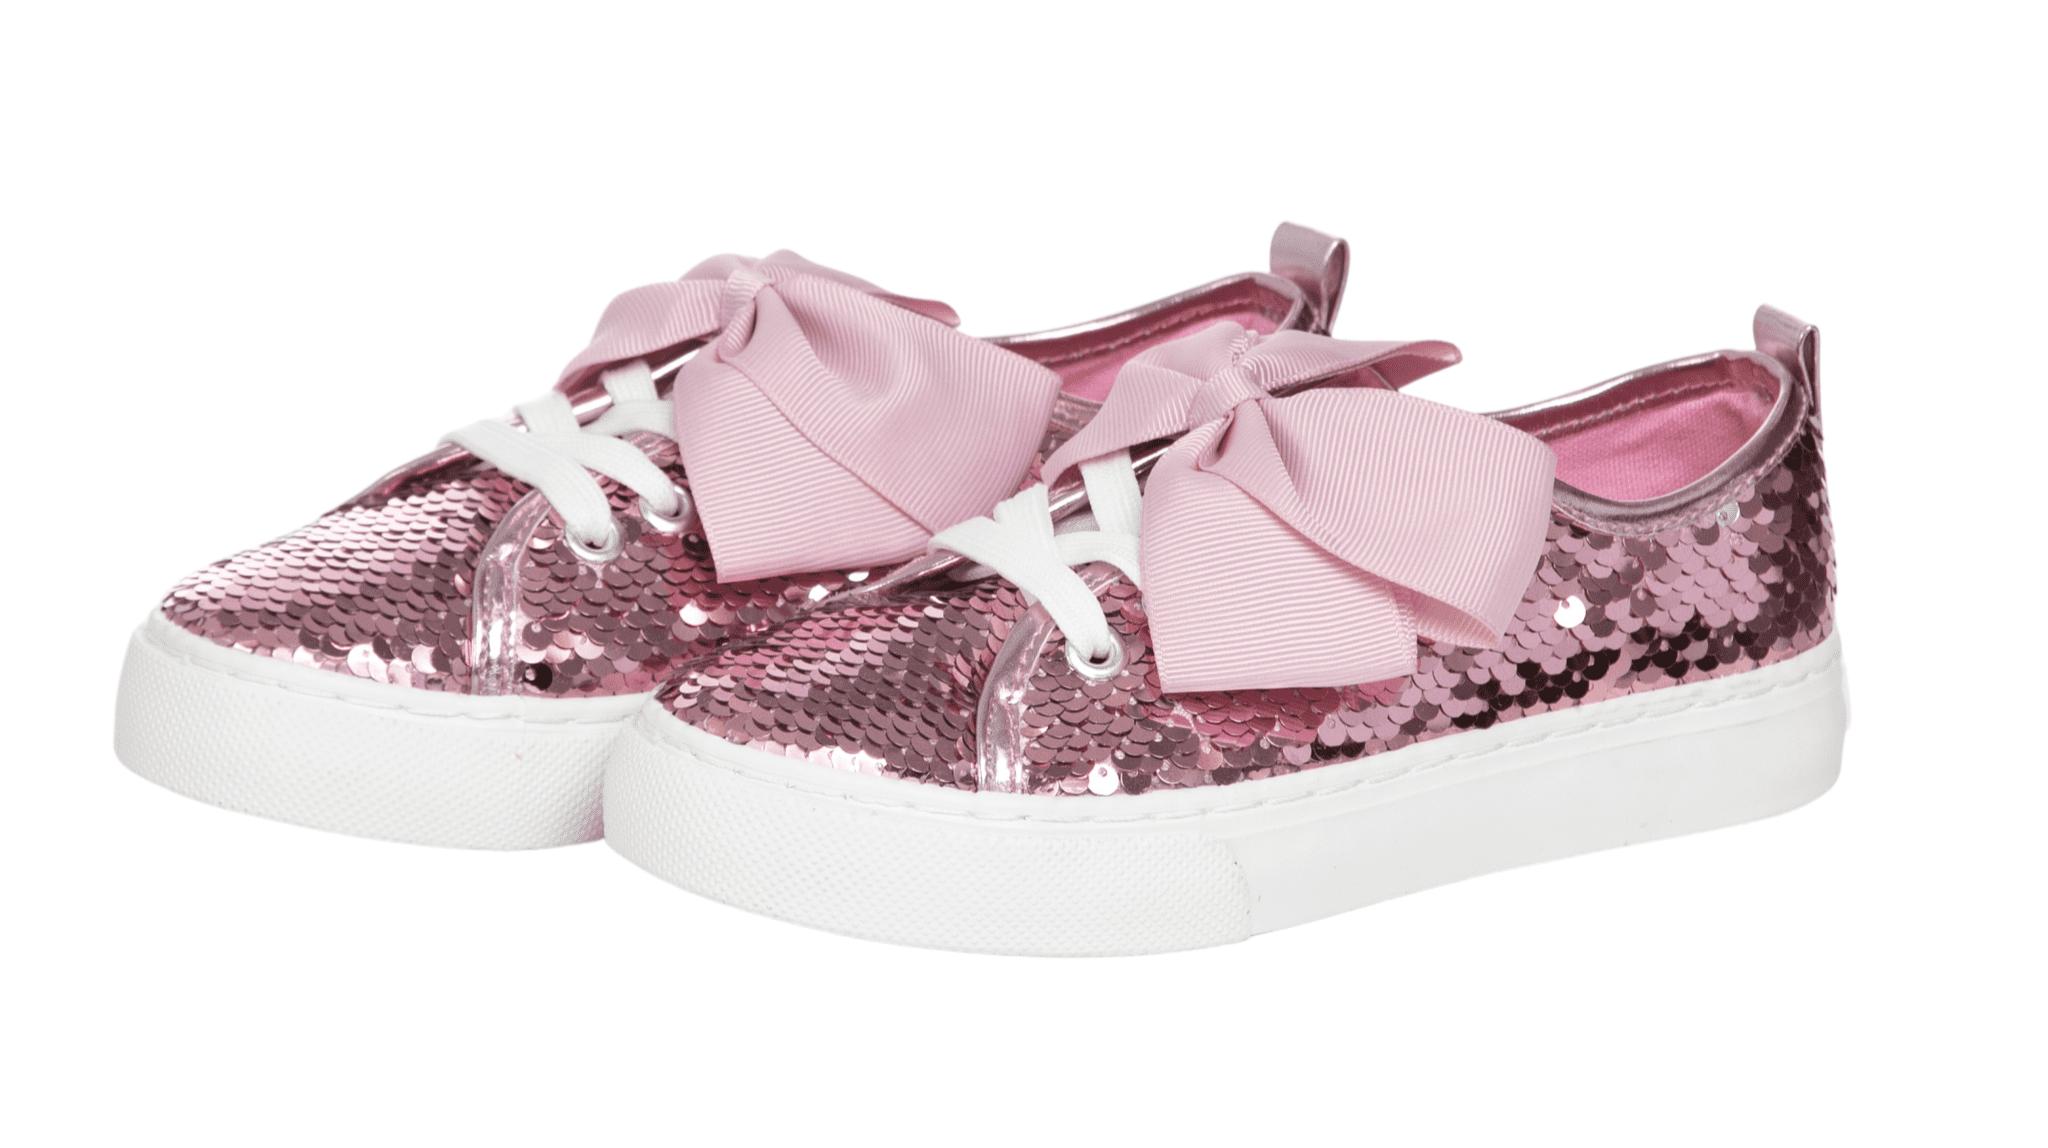 Little Girl//Big Girl Size JoJo Siwa Girls Reversible Sequins High Top Sneakers